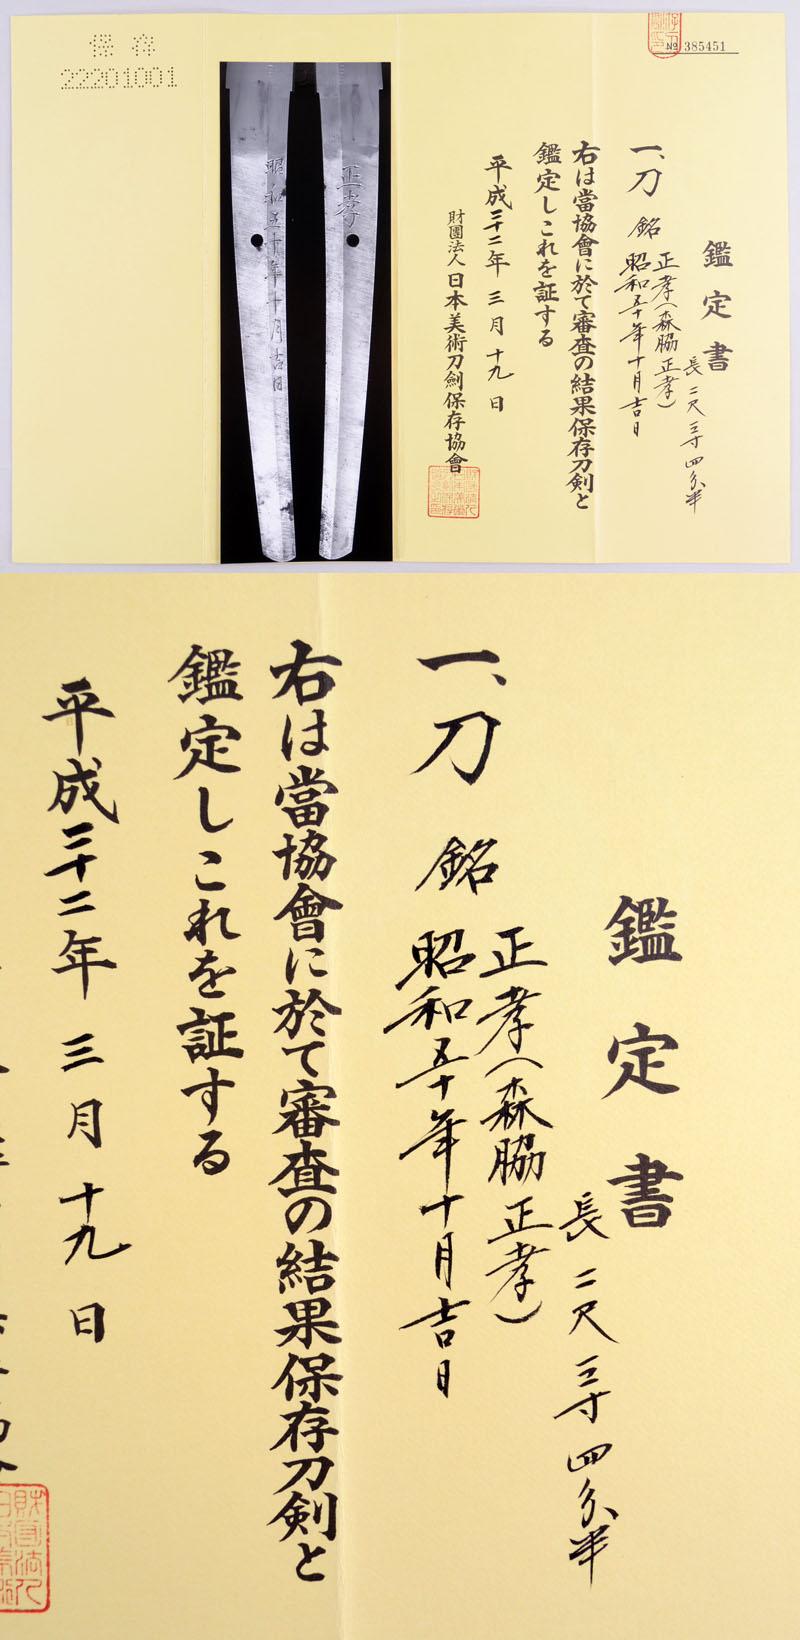 刀 正孝(森脇正孝) Picture of Certificate